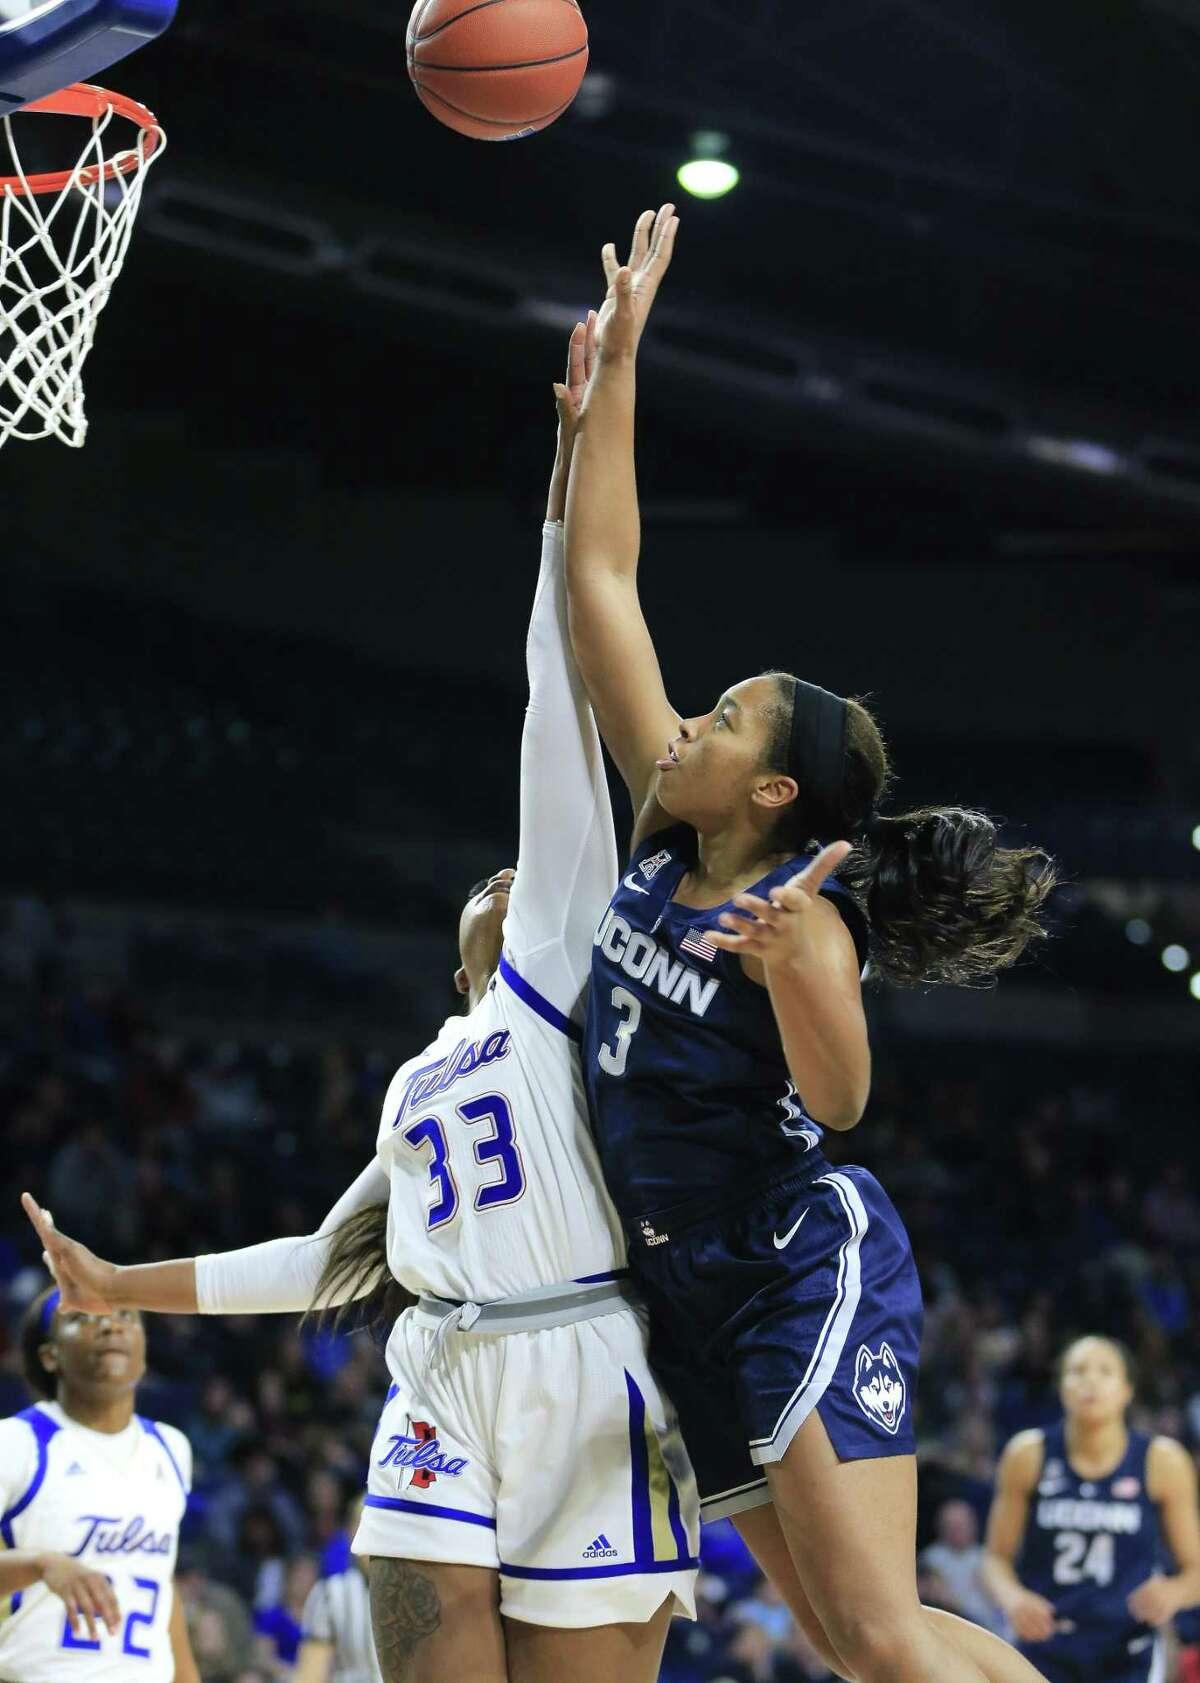 UConn's Megan Walker drives to the basket against Tulsa's Crystal Polk on Sunday. UConn won 68-49.